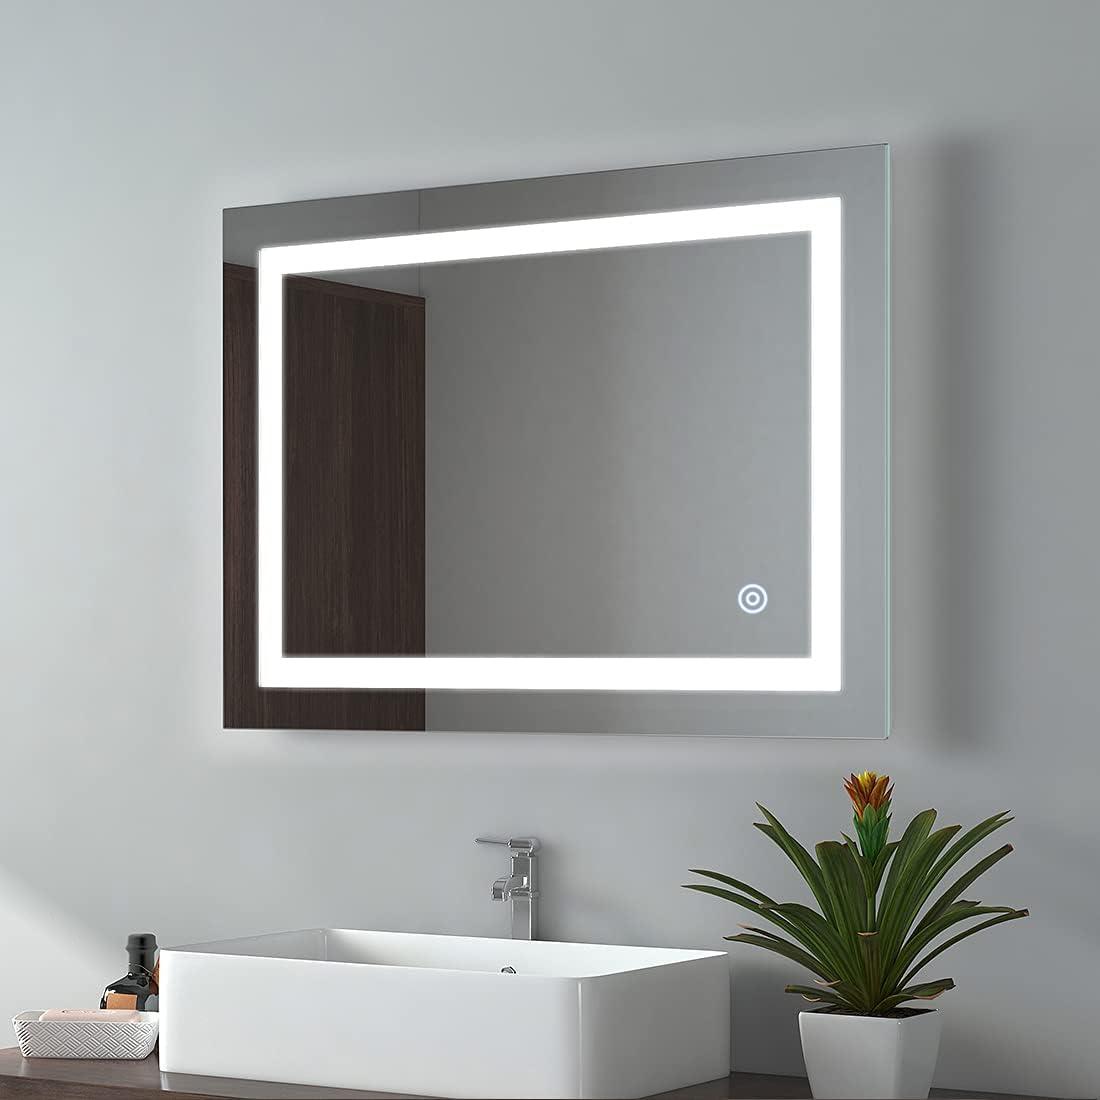 Buy Emke 24 X 32 Inch Led Bathroom Vanity Mirrors Dimmable Bathroom Mirror With Lights For Wall 3000 6500k Adjustable Warm Ip44 Waterproof Cri 90 Ul Listed Horizontal Vertical Online In Germany B08gp9wct3